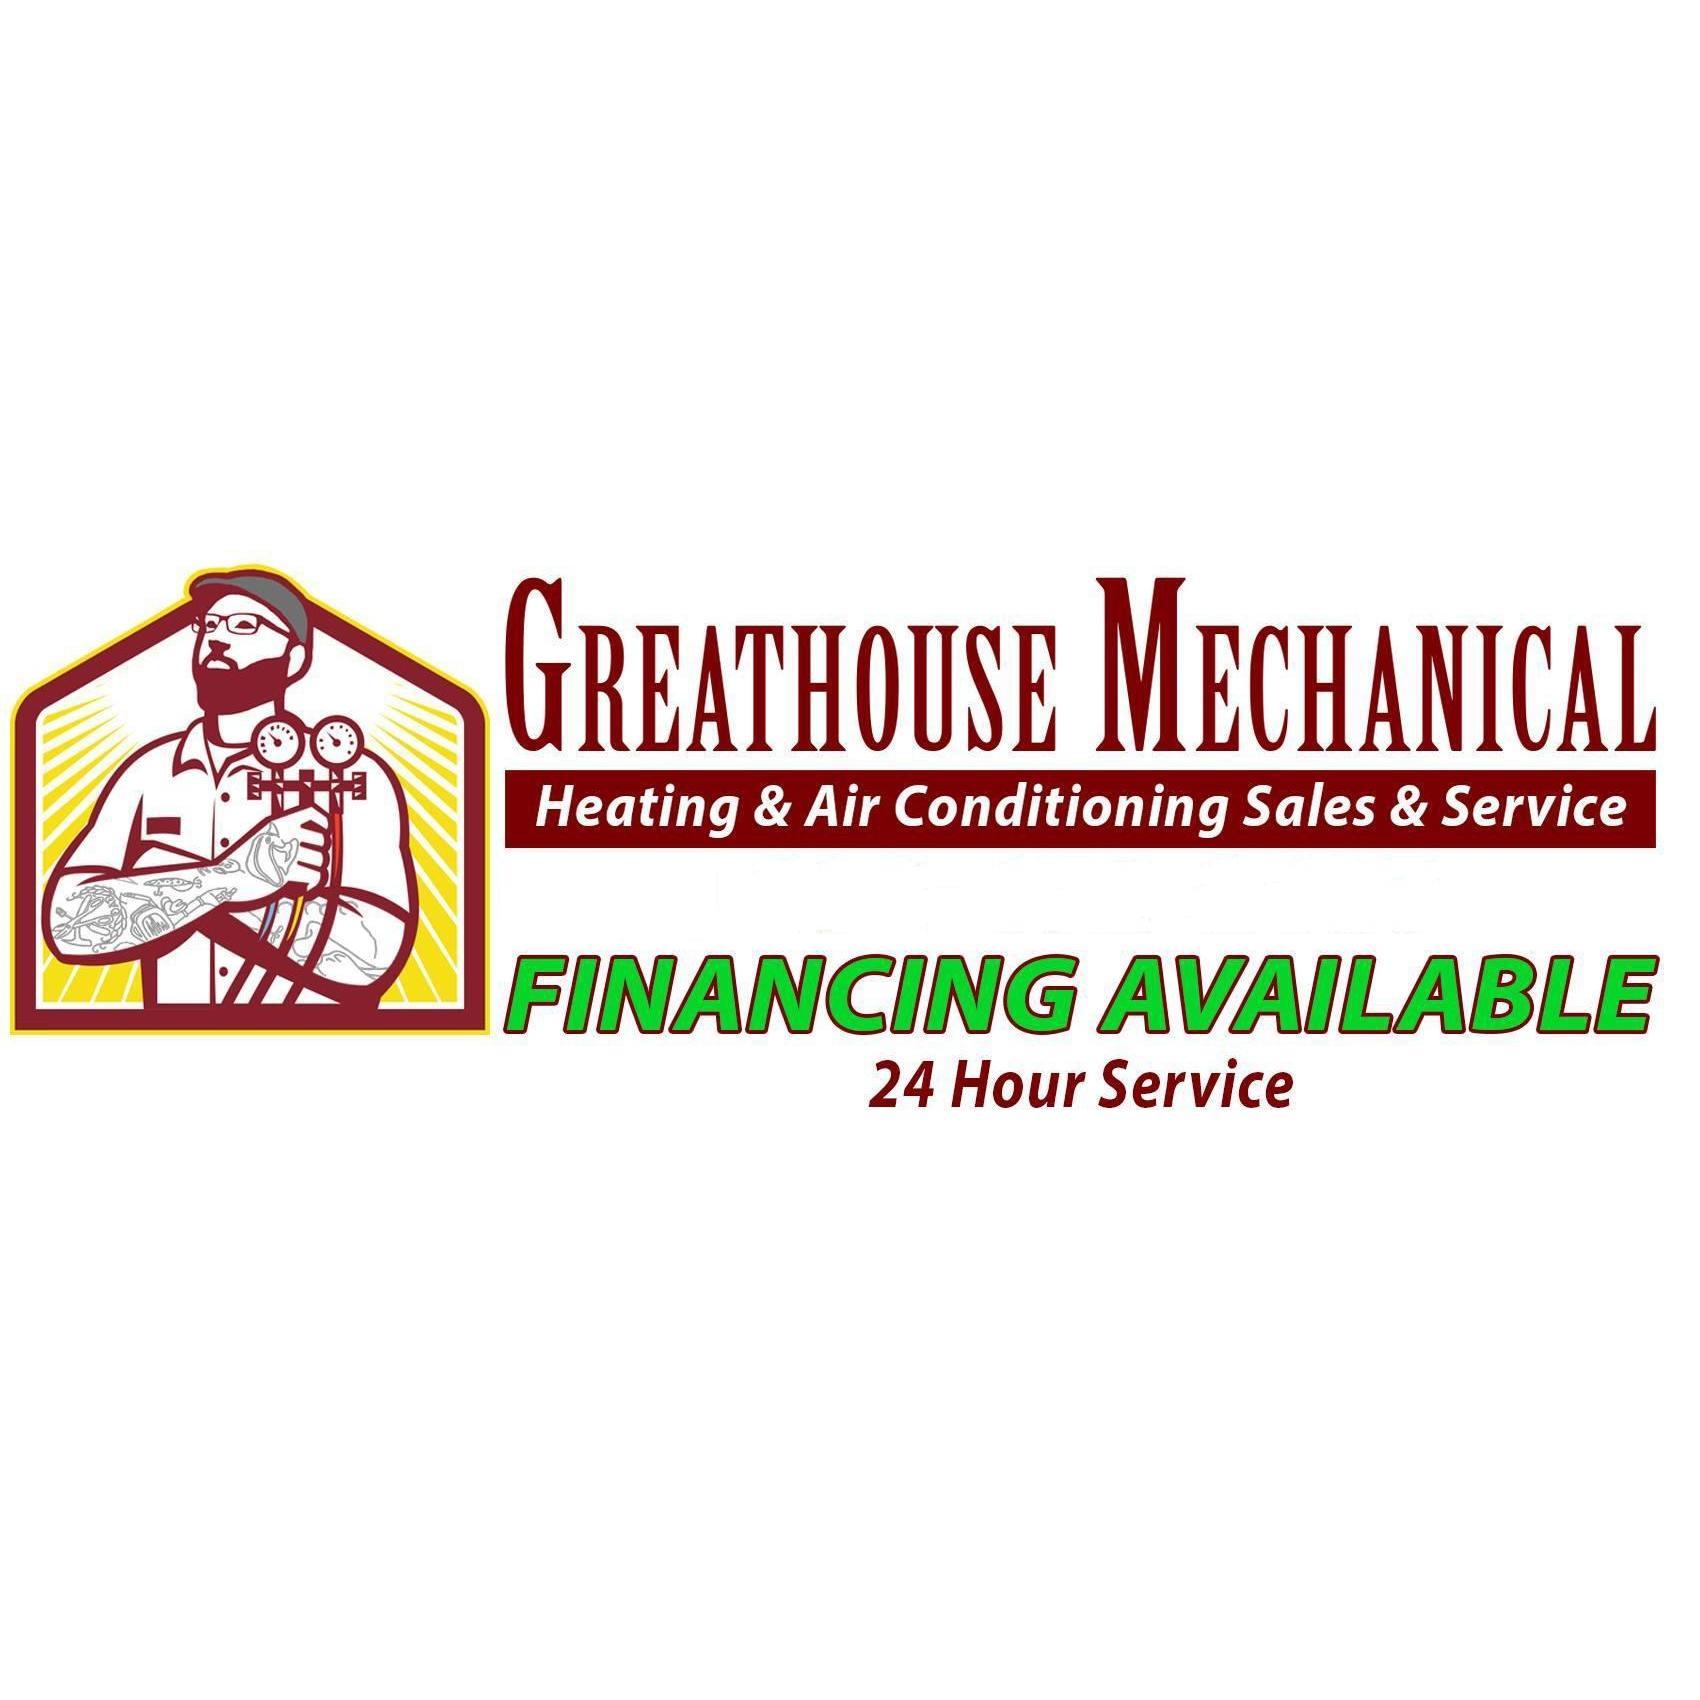 Greathouse Mechanical LLC